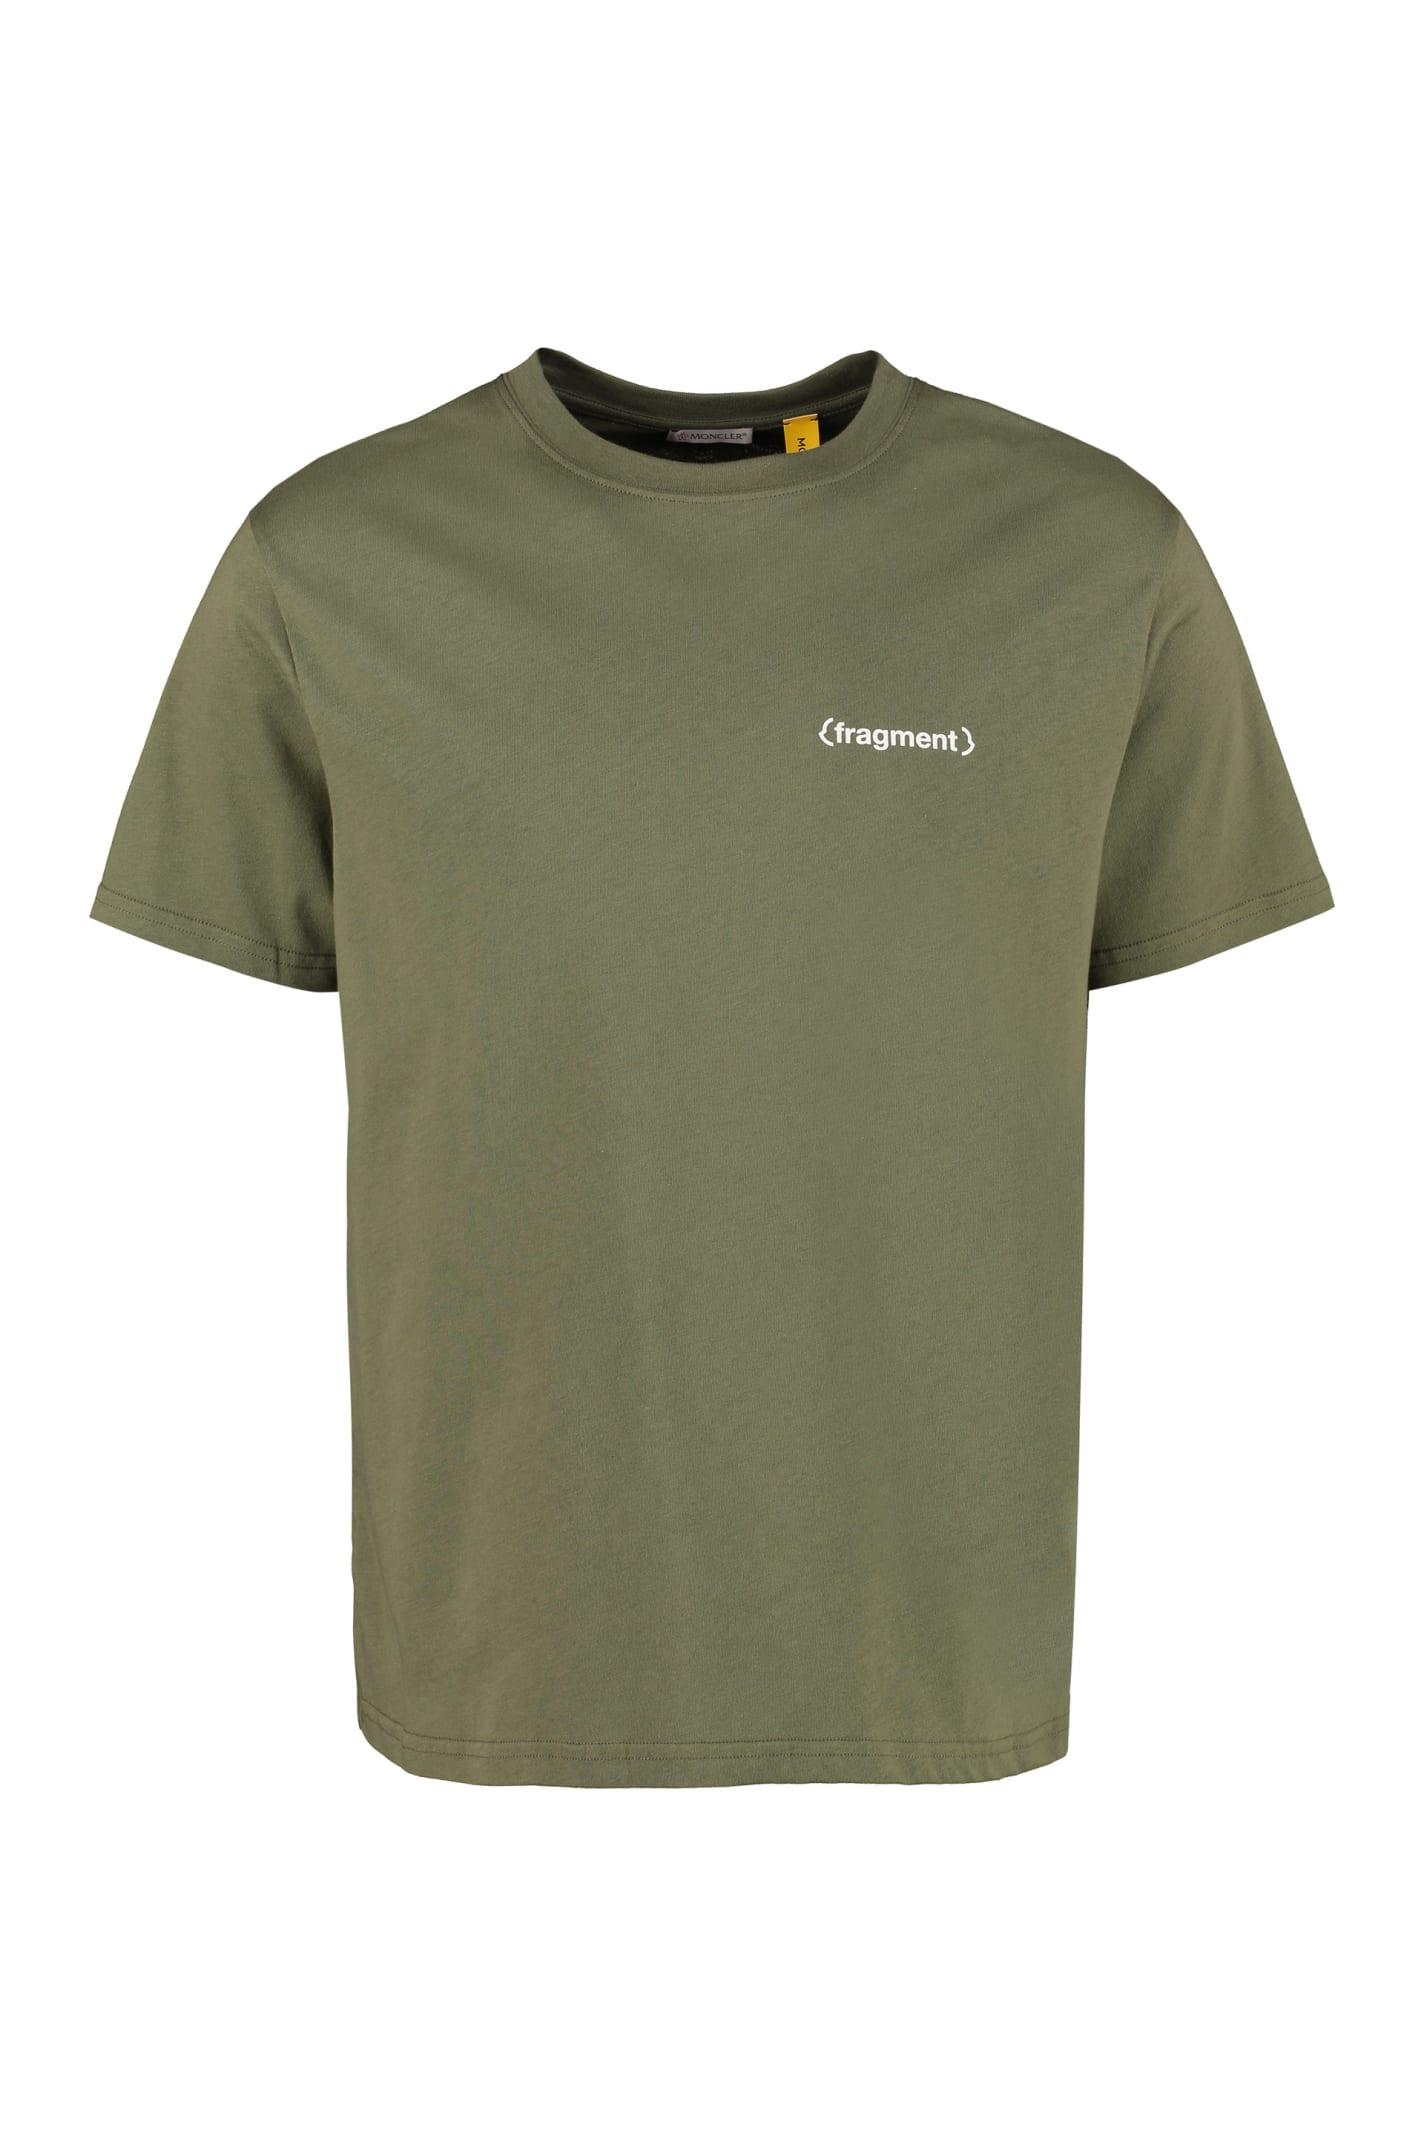 Moncler Genius Printed Cotton T-shirt